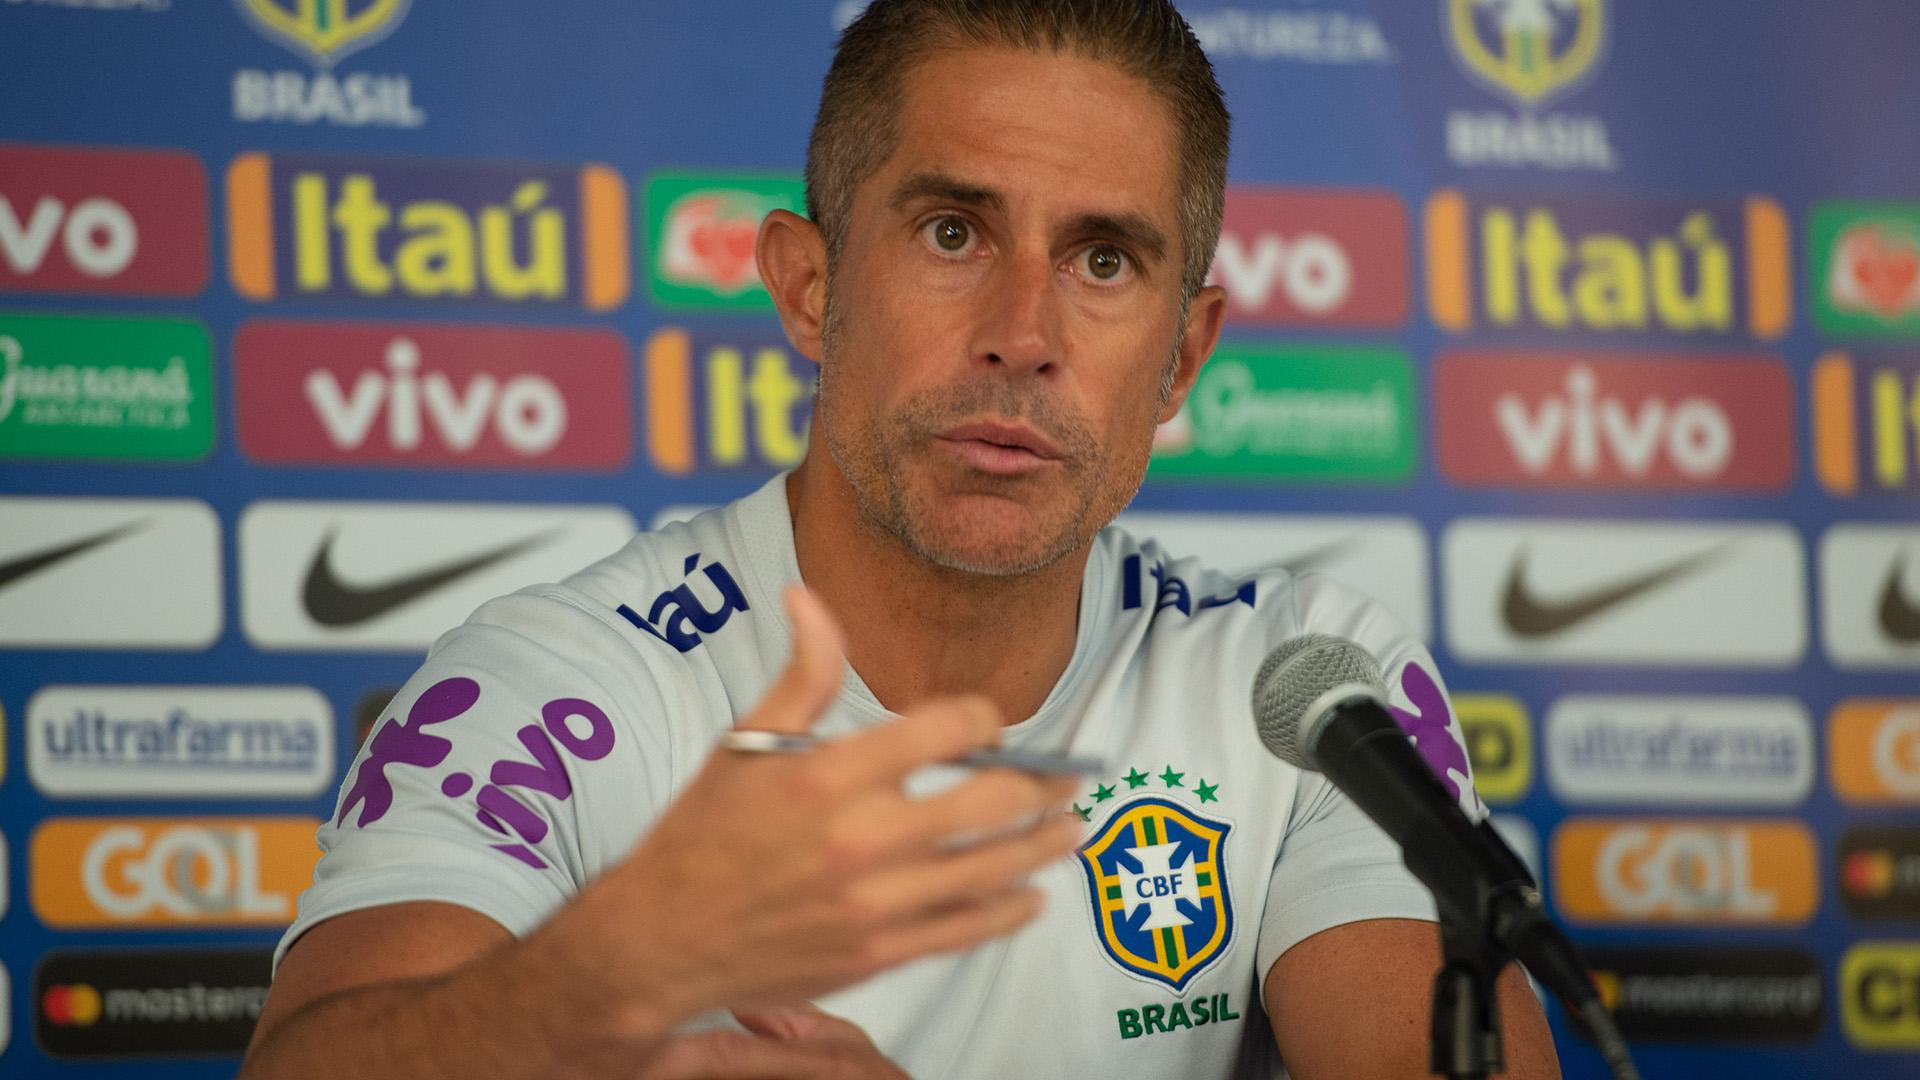 Brazil to play Cameroon at Stadium MK in Milton Keynes next month